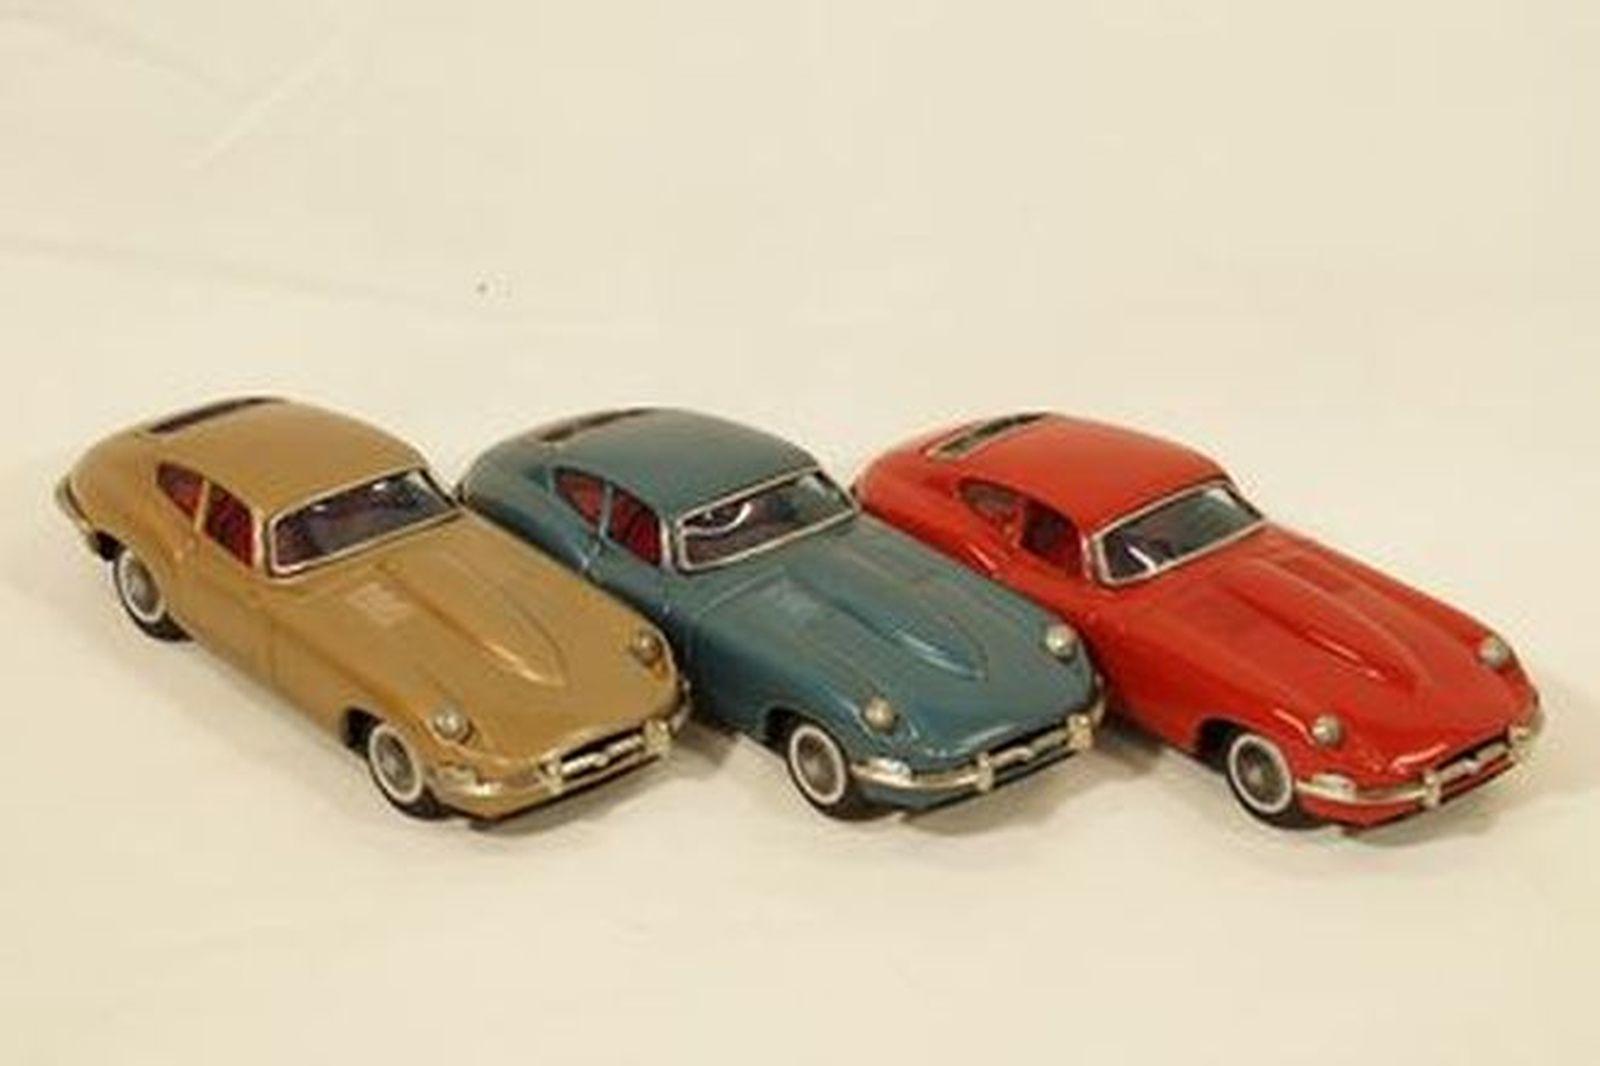 Sold Model Cars X 3 1960s Jaguar E Type Tinplate In Metallic Blue Gold